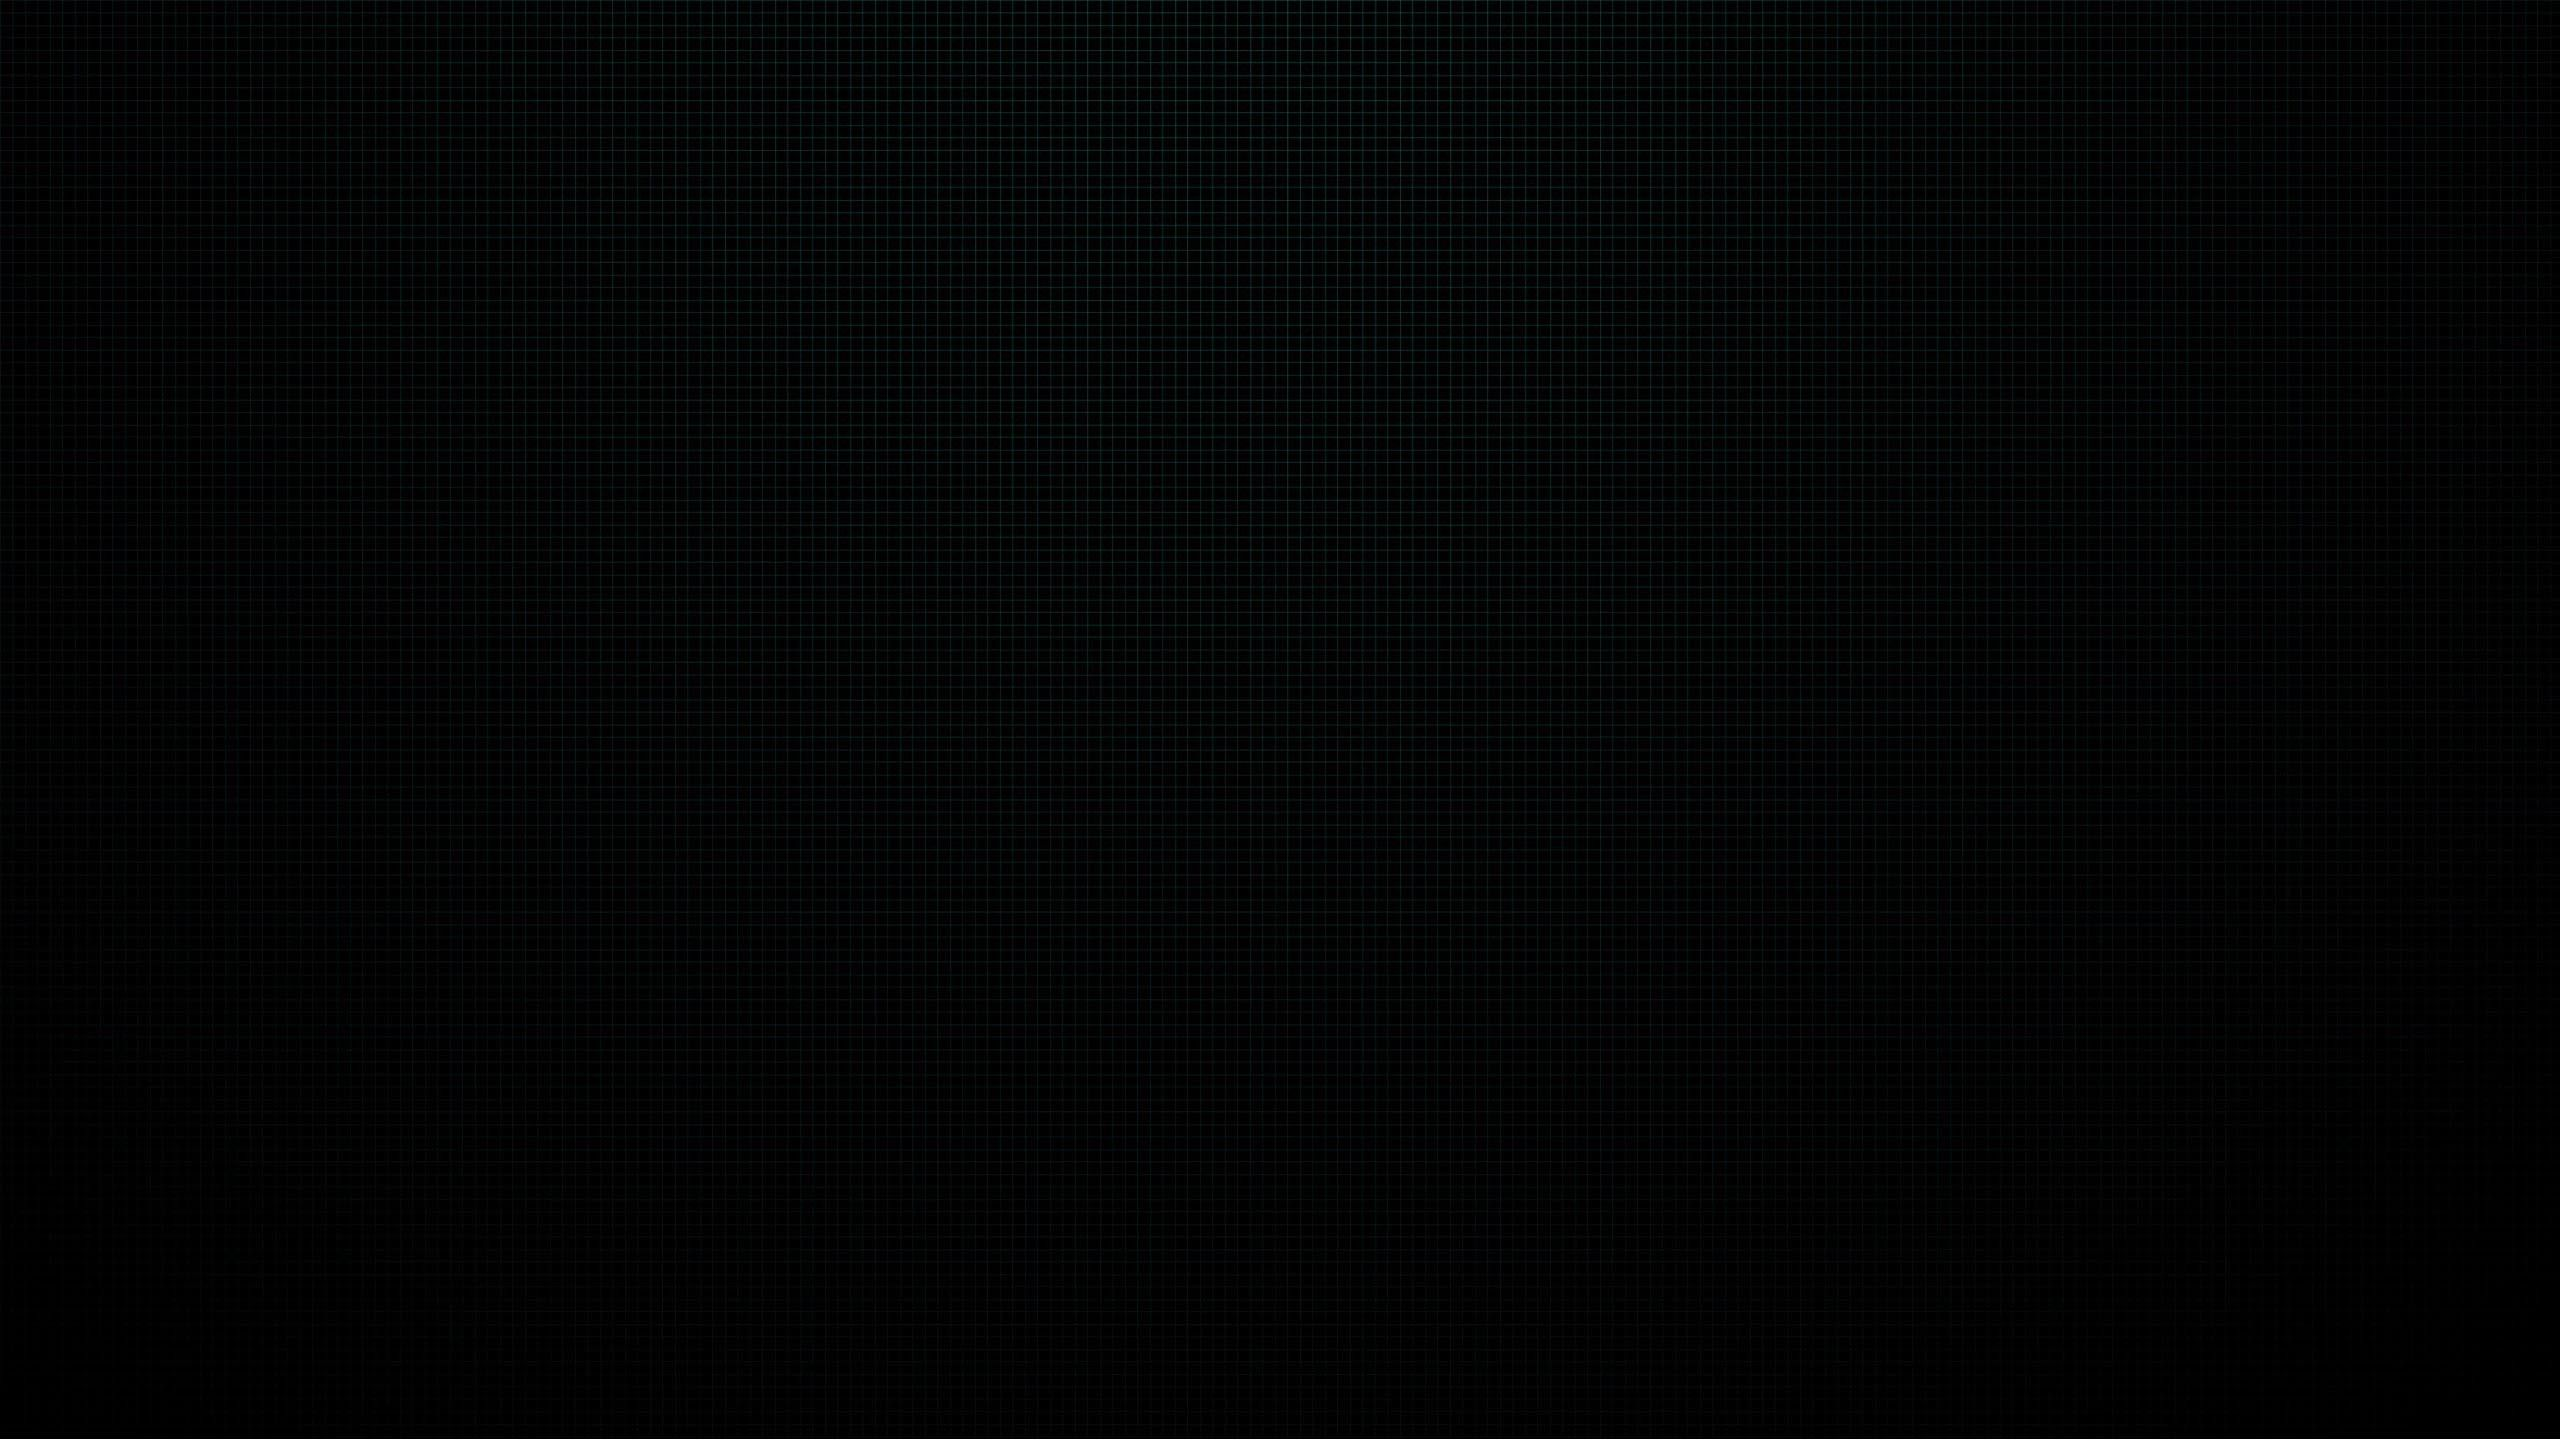 dark screen wallpaper